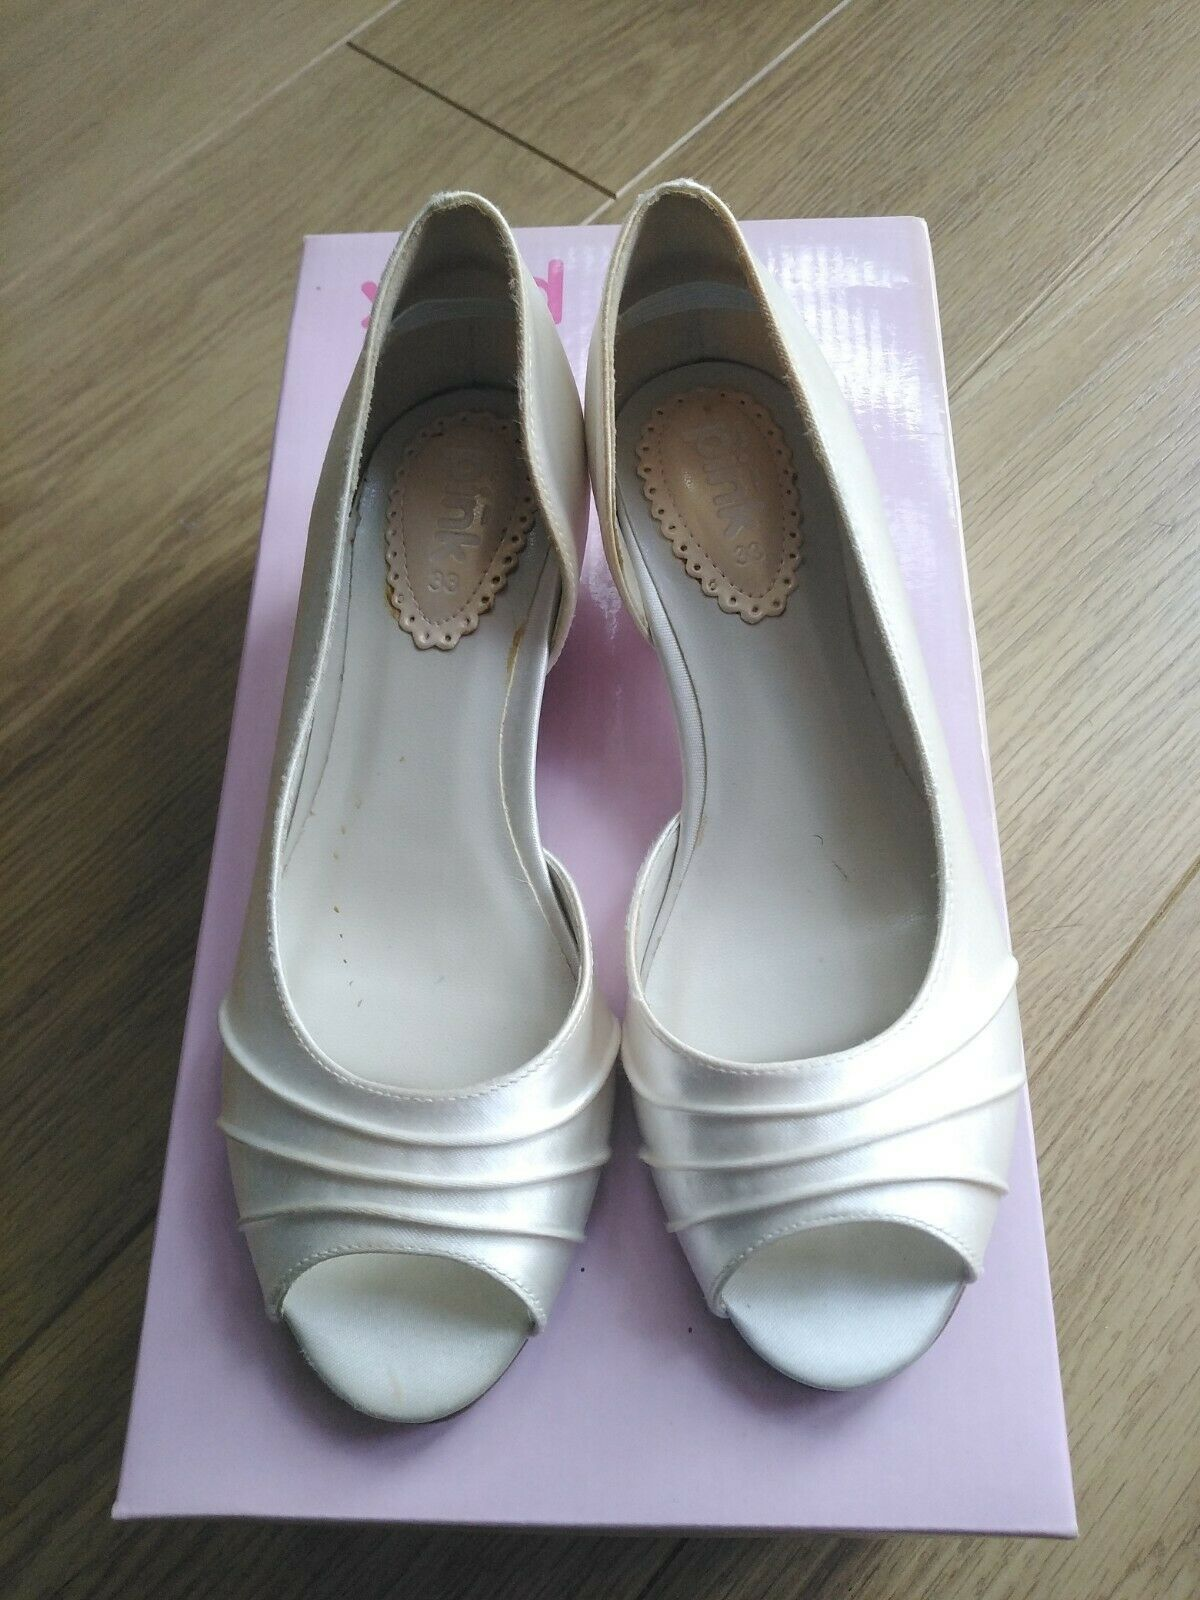 Flowergirl, Bridesmaid, Girl's satin shoe with small heel Size 33 UK 1